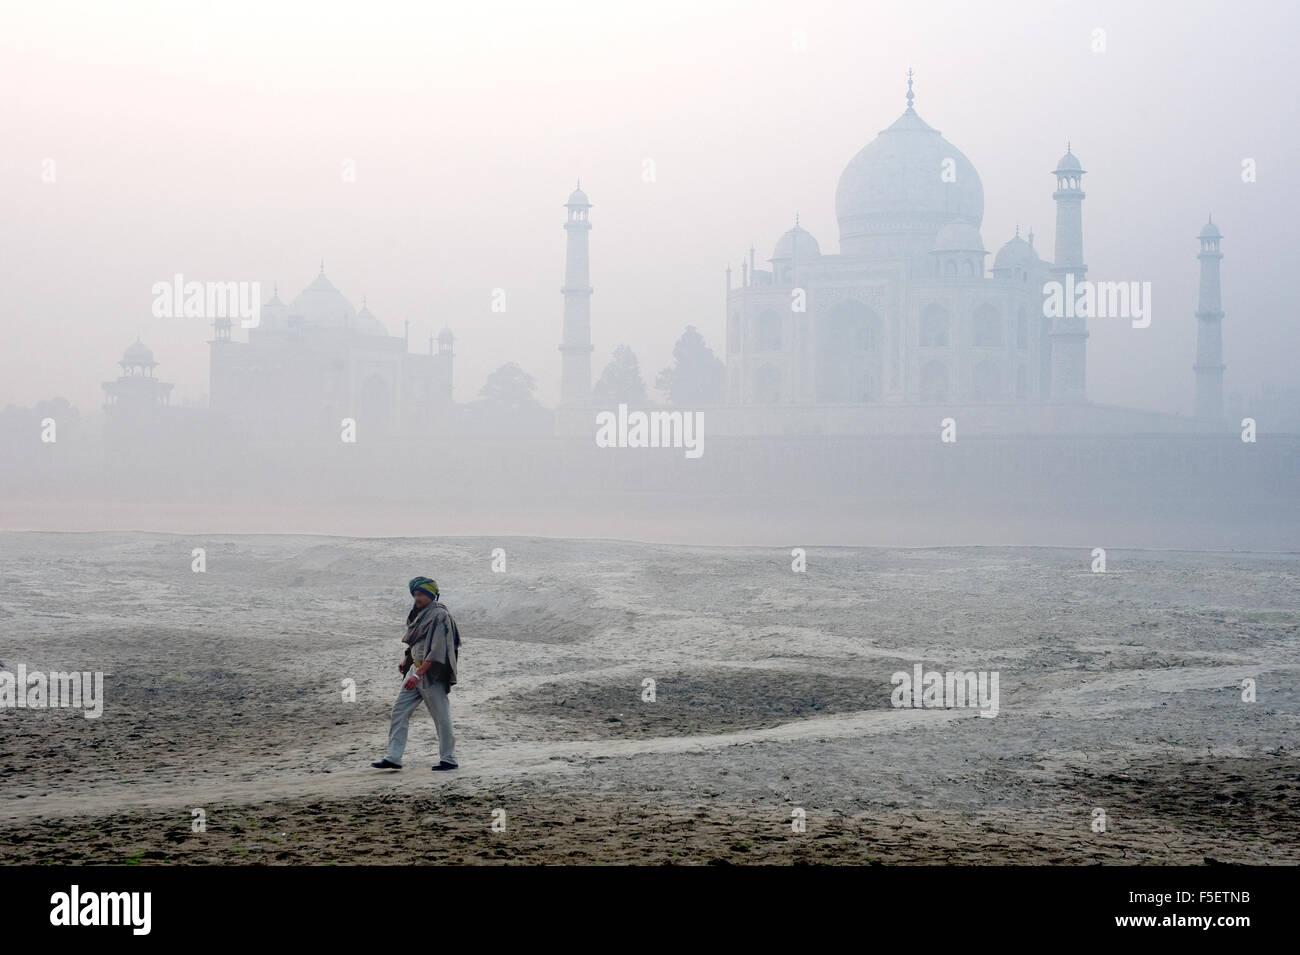 Taj Mahal Wache Spaziergänge am Ufer des Flusses Yamuna. Stockbild